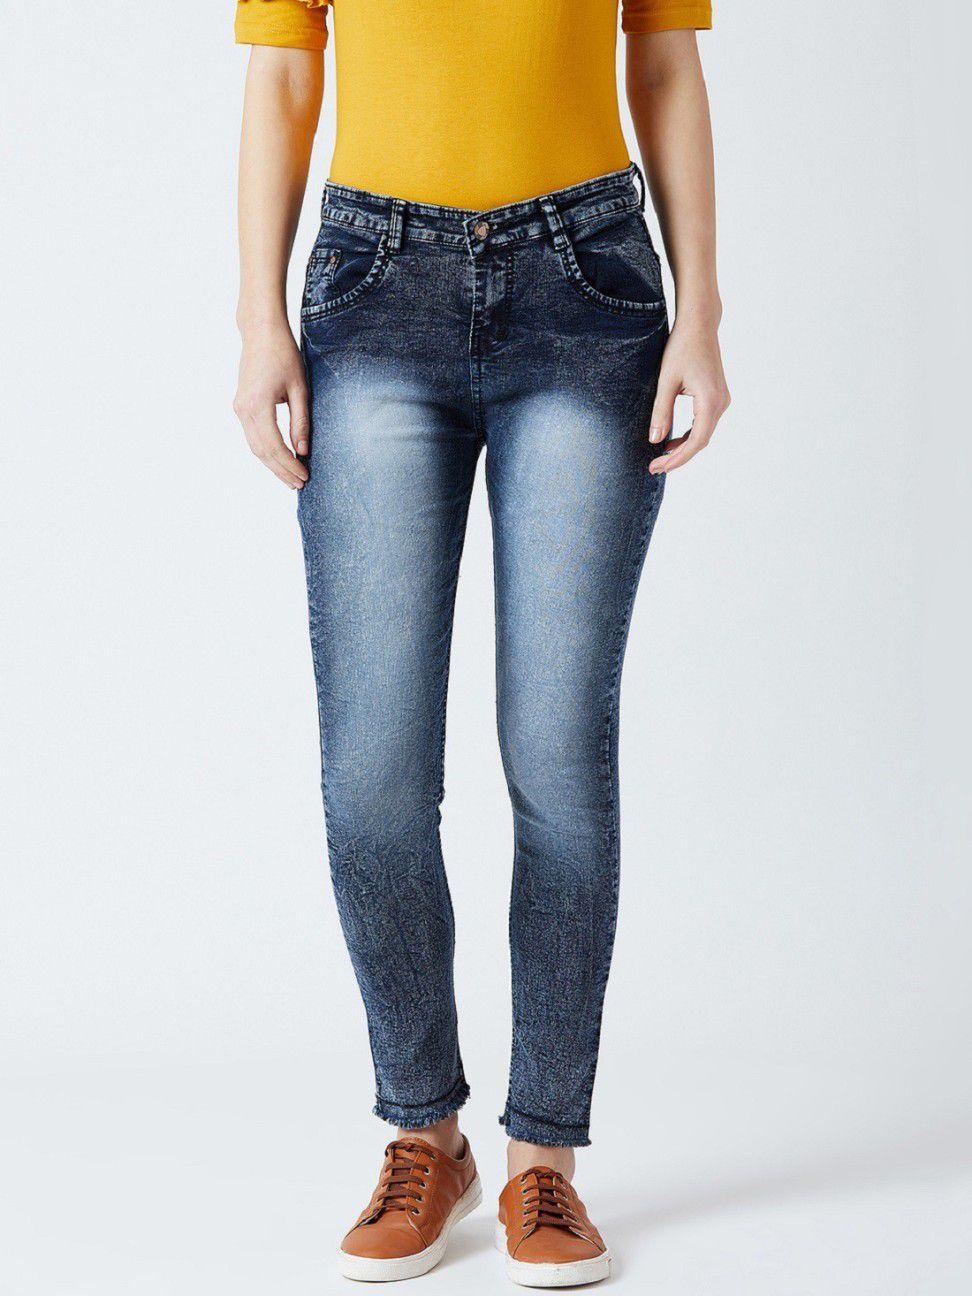 Bombay Clothing Company Denim Jeans - Blue